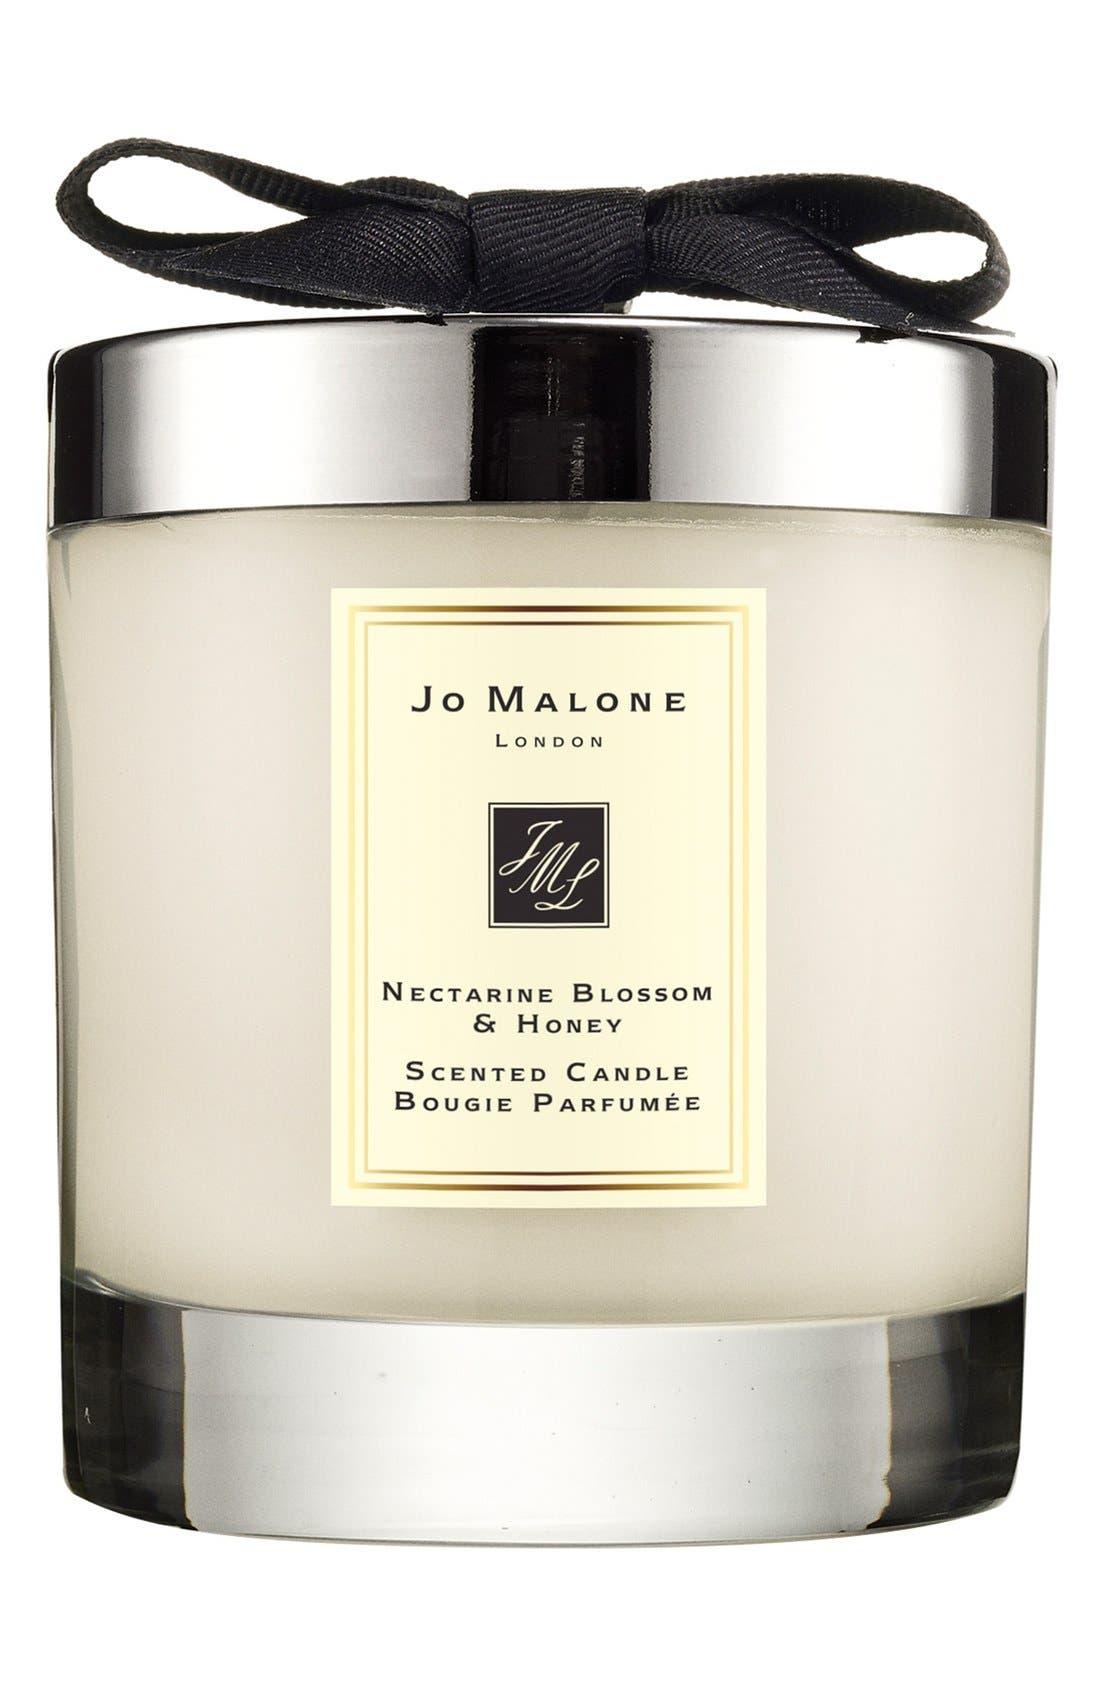 JO MALONE LONDON™ Jo Malone™ 'Nectarine Blossom &